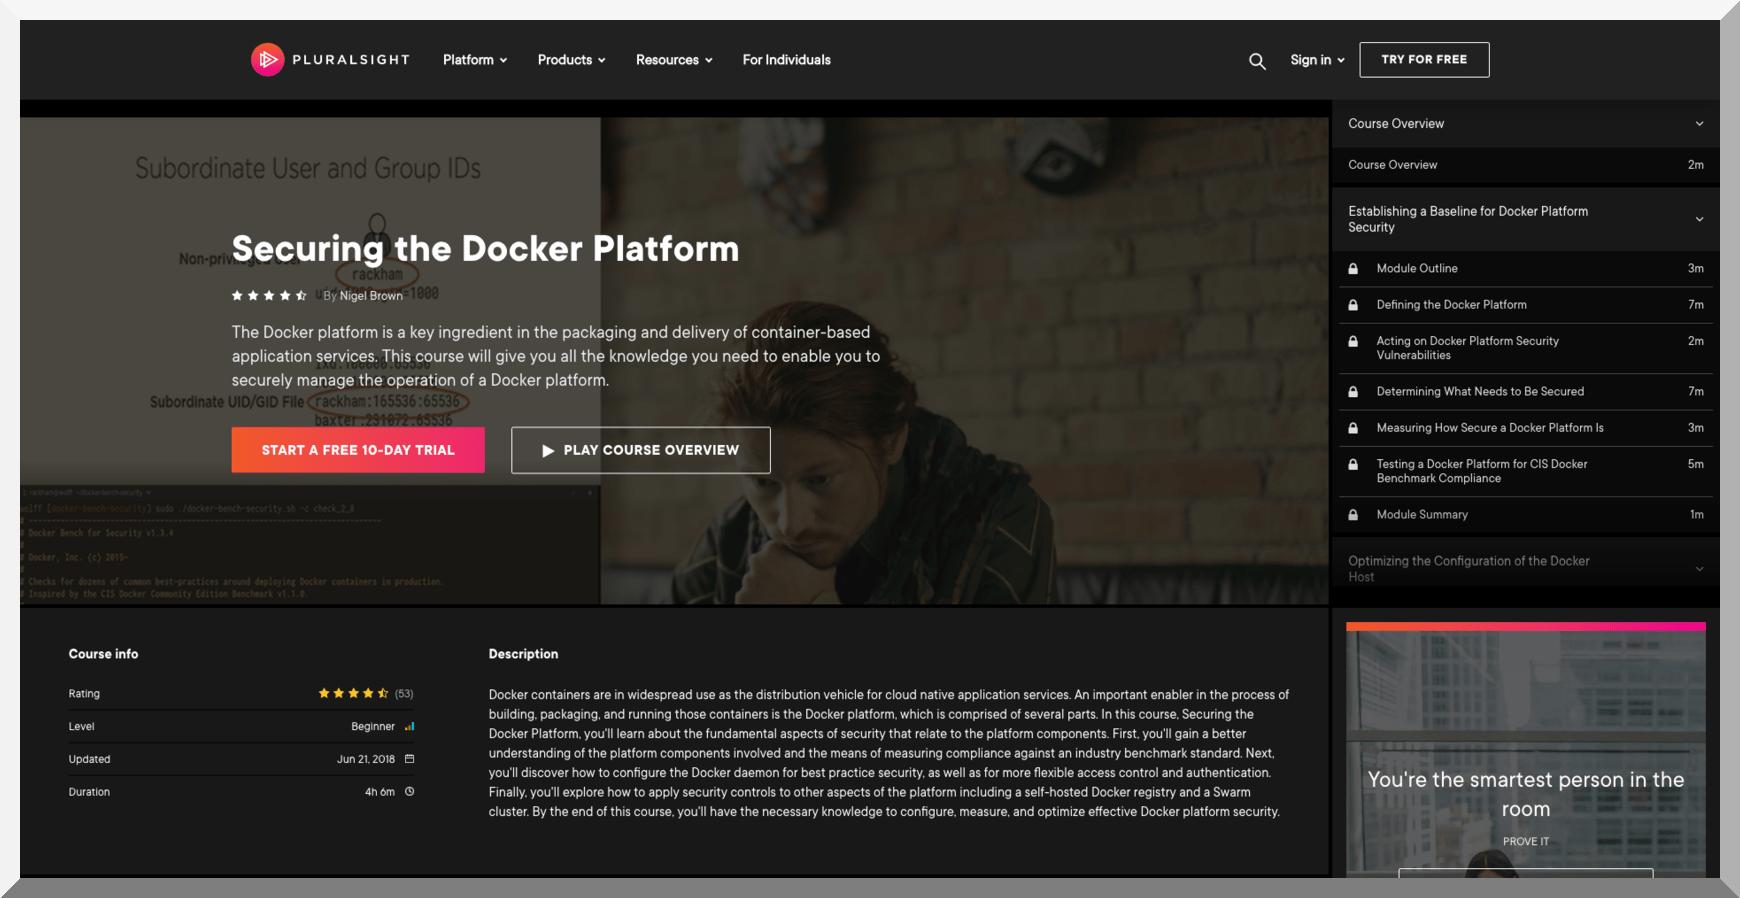 Securing the Docker Platform – Pluralsight